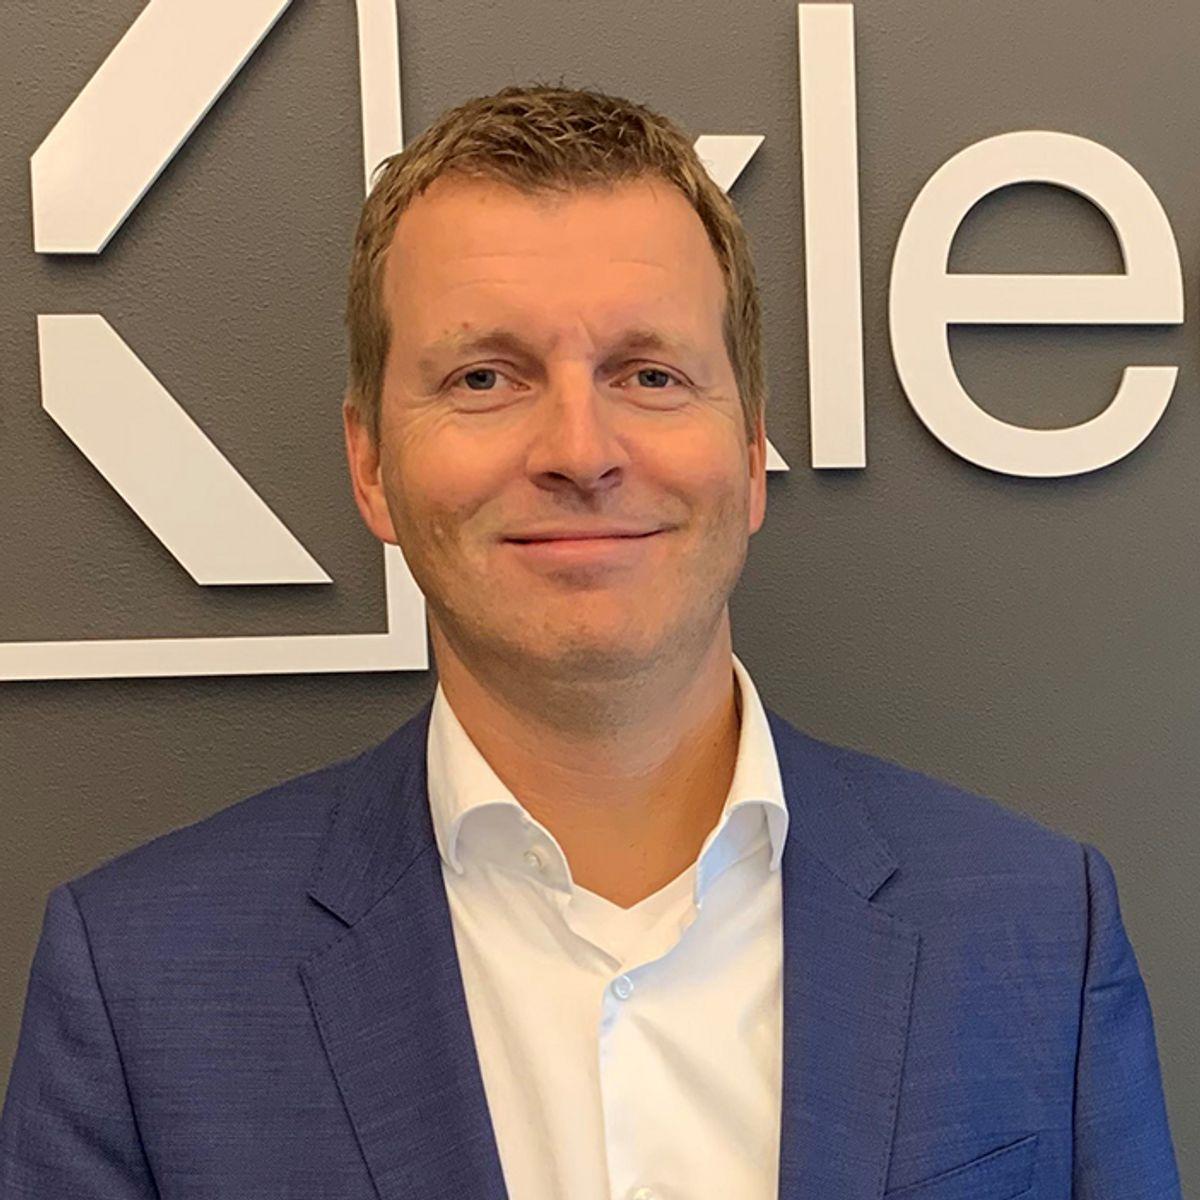 Ove Jørgen Carlsen, administrerende direktør i Xledger.